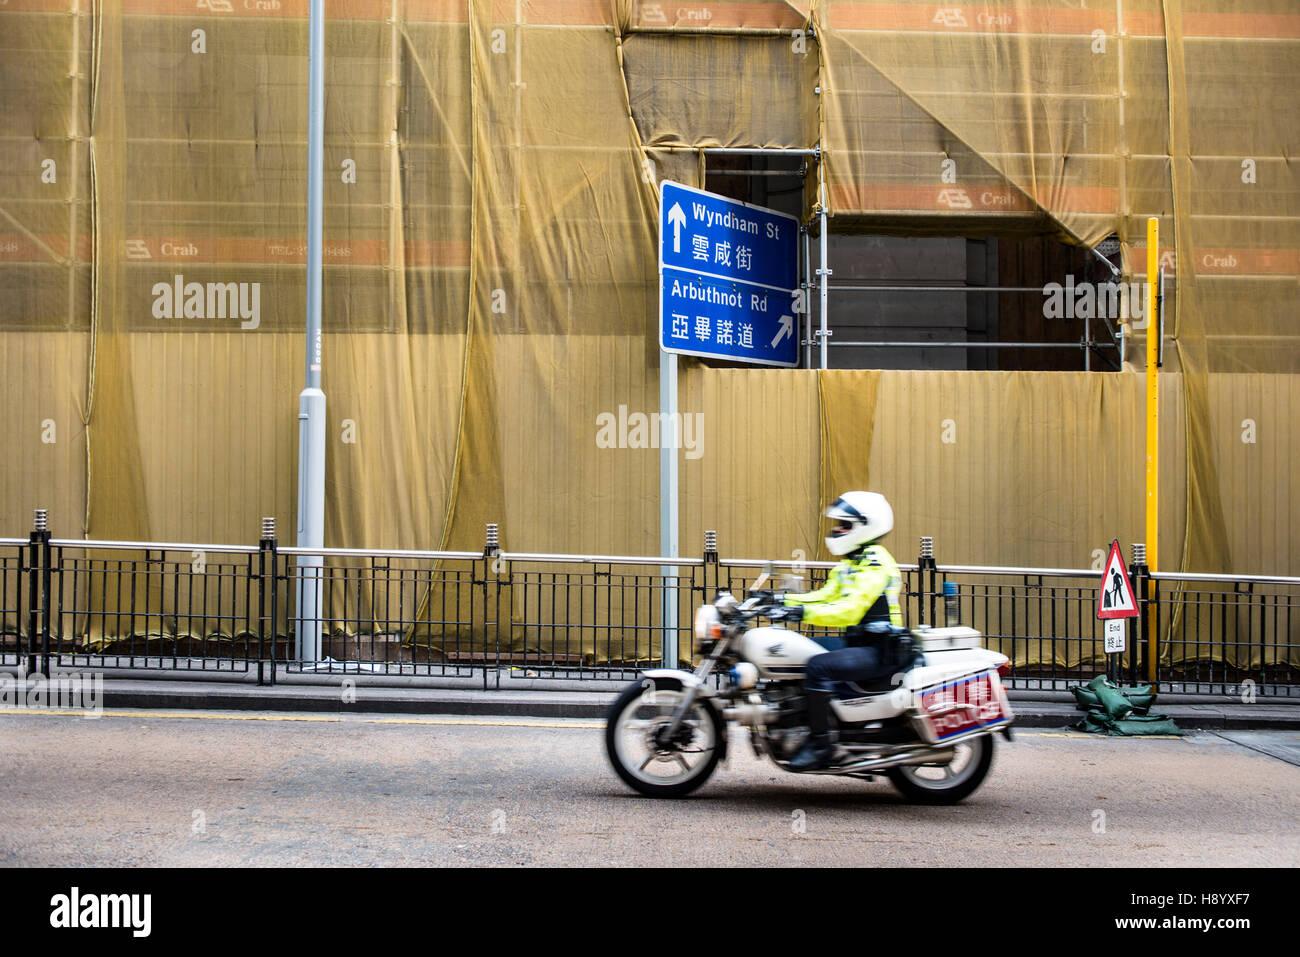 Hong Kong, 2013 Former police station under renovation on Hollywood road. - Stock Image